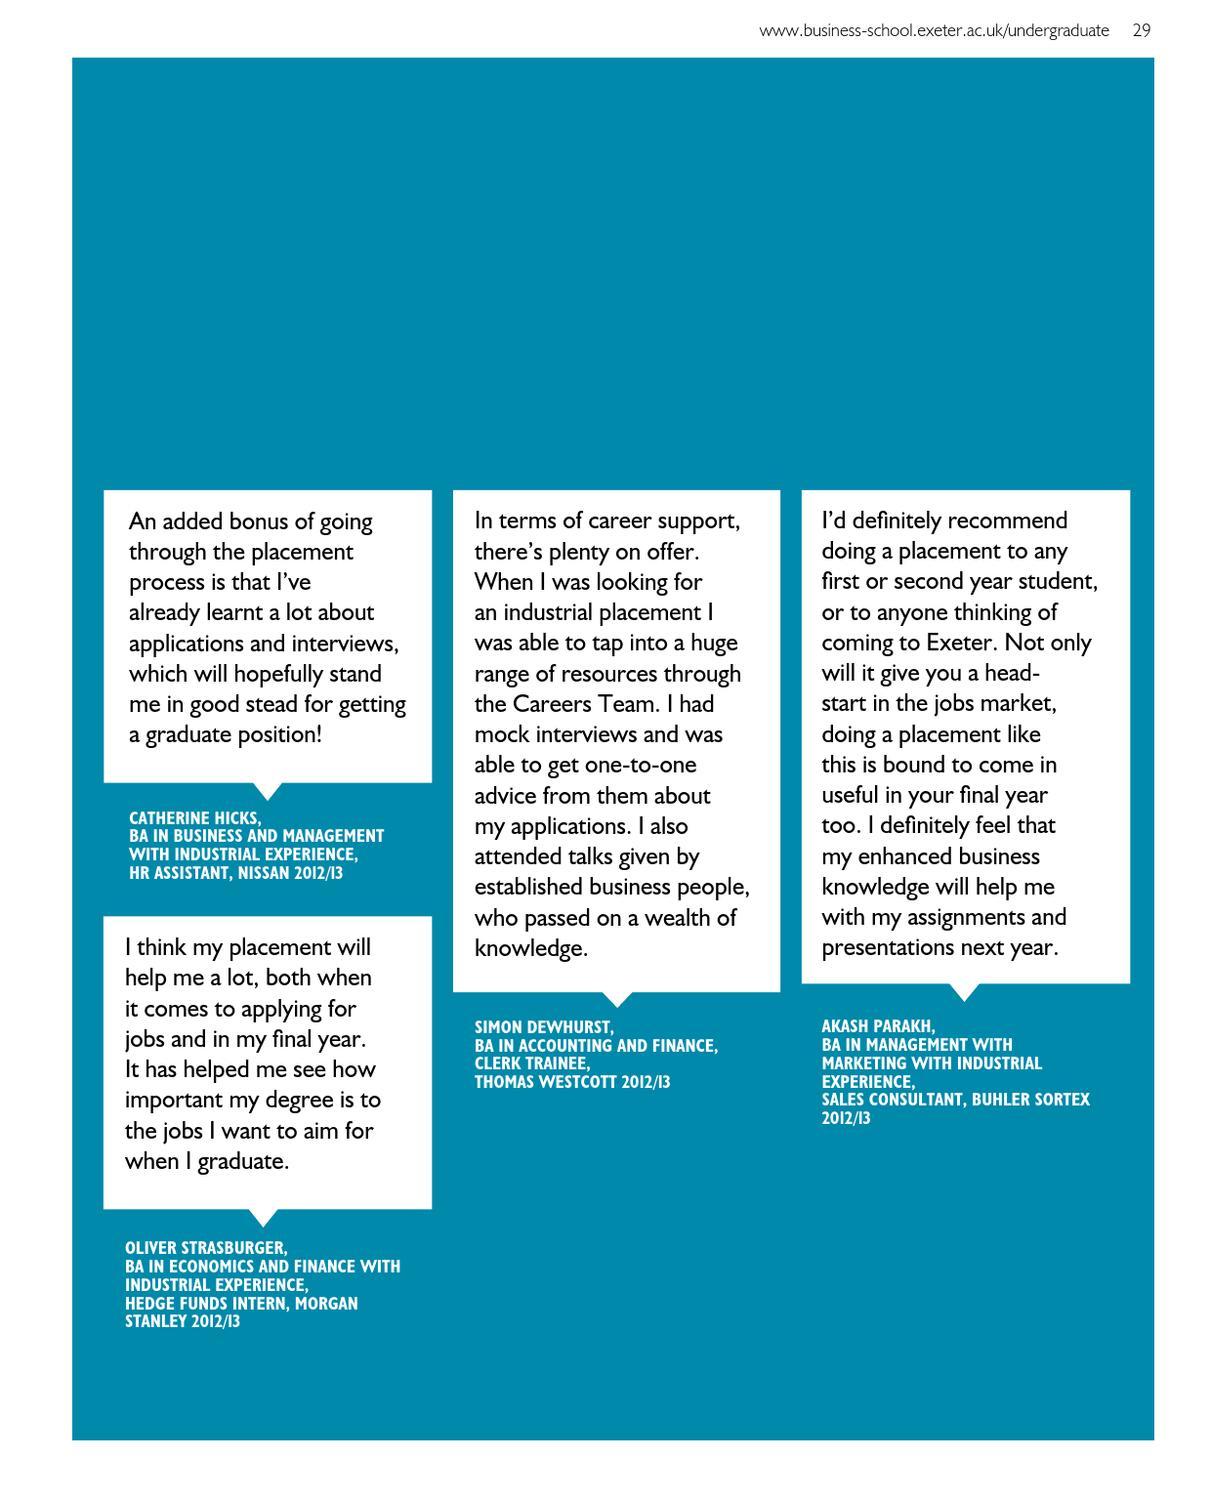 Business School UG Prospectus 2014 by University of Exeter - issuu